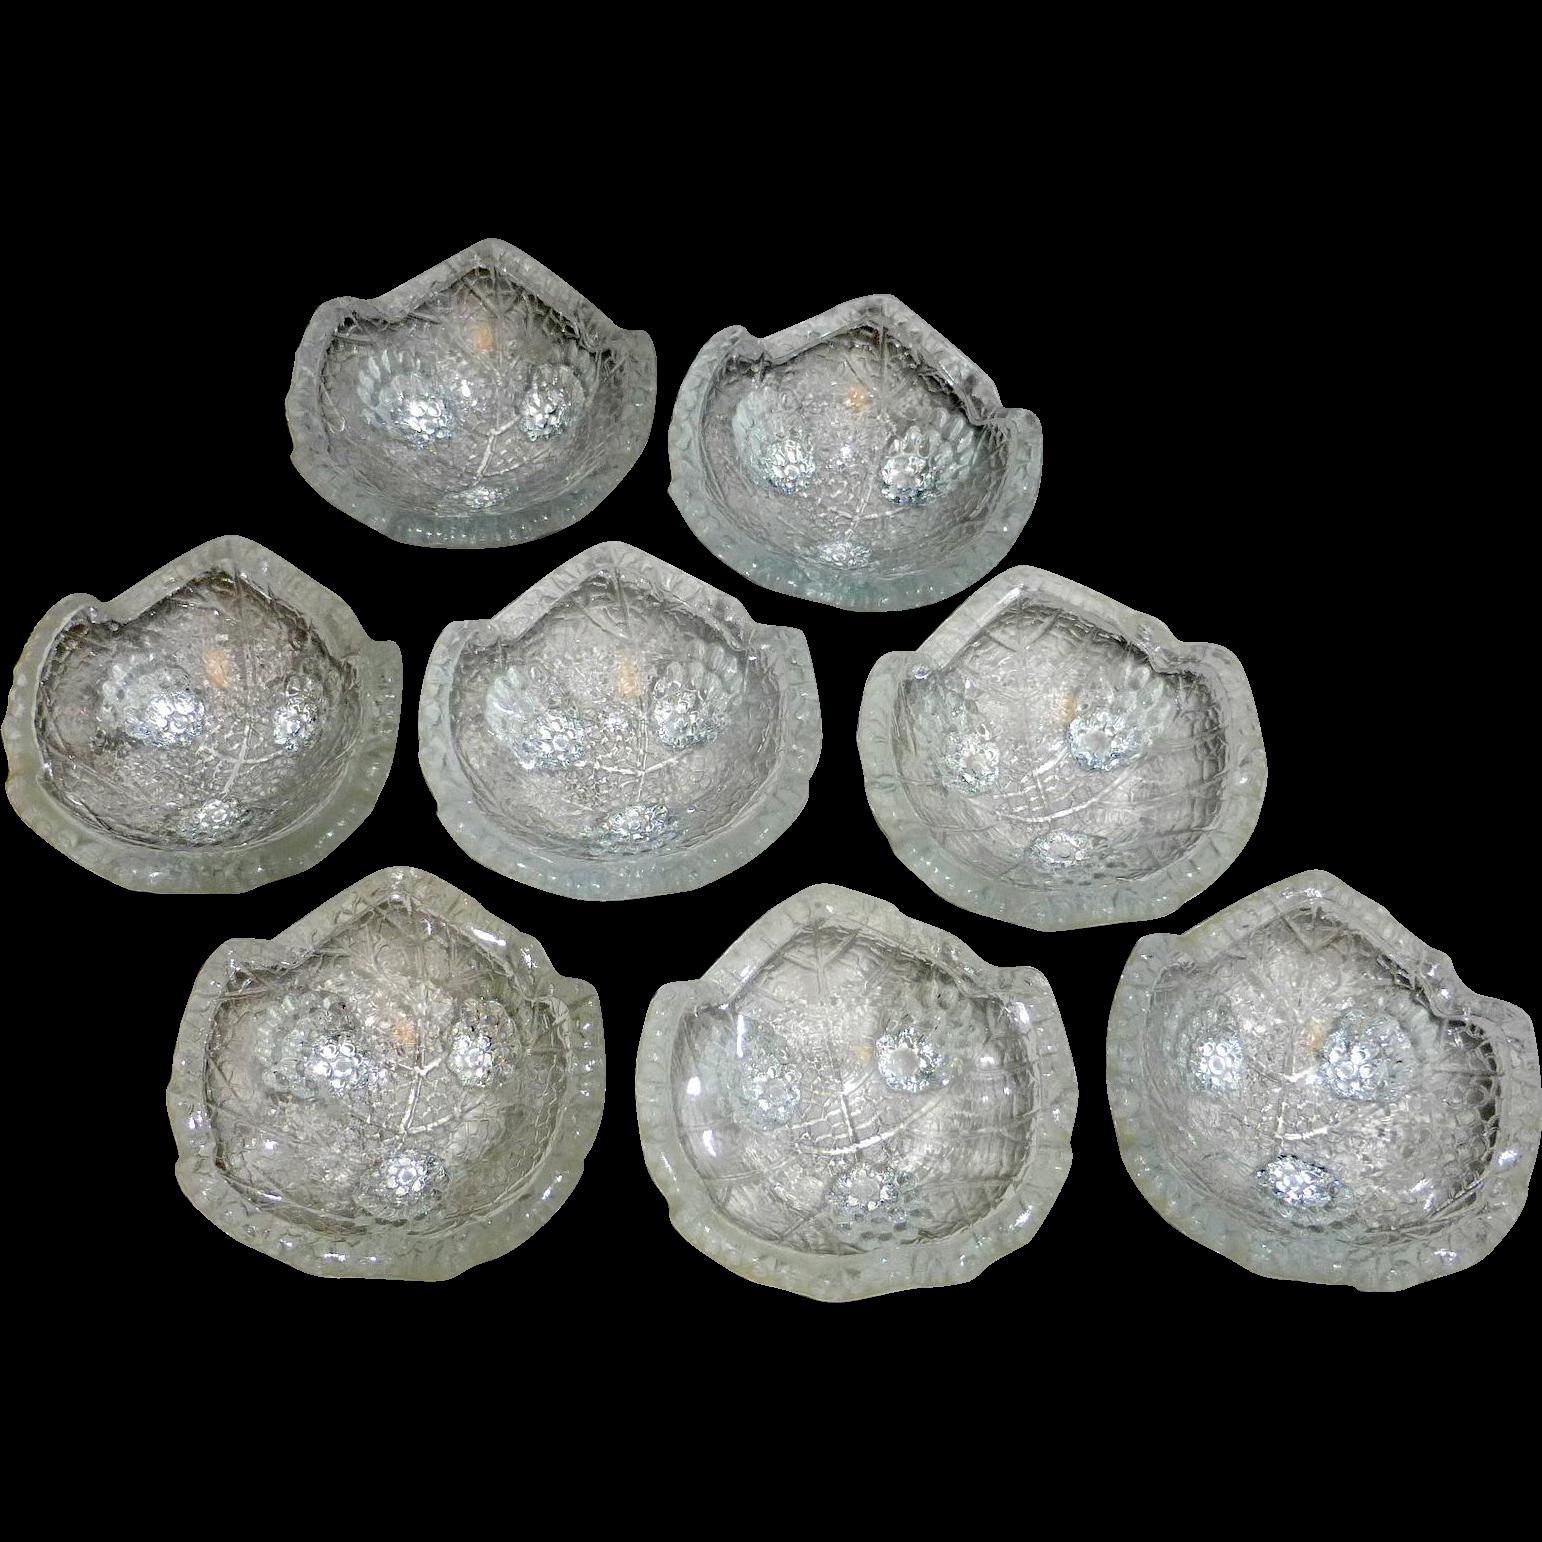 8 Vintage Glass Holiday Table Open Salt Dips 3 Legs Grape Leaf Clusters